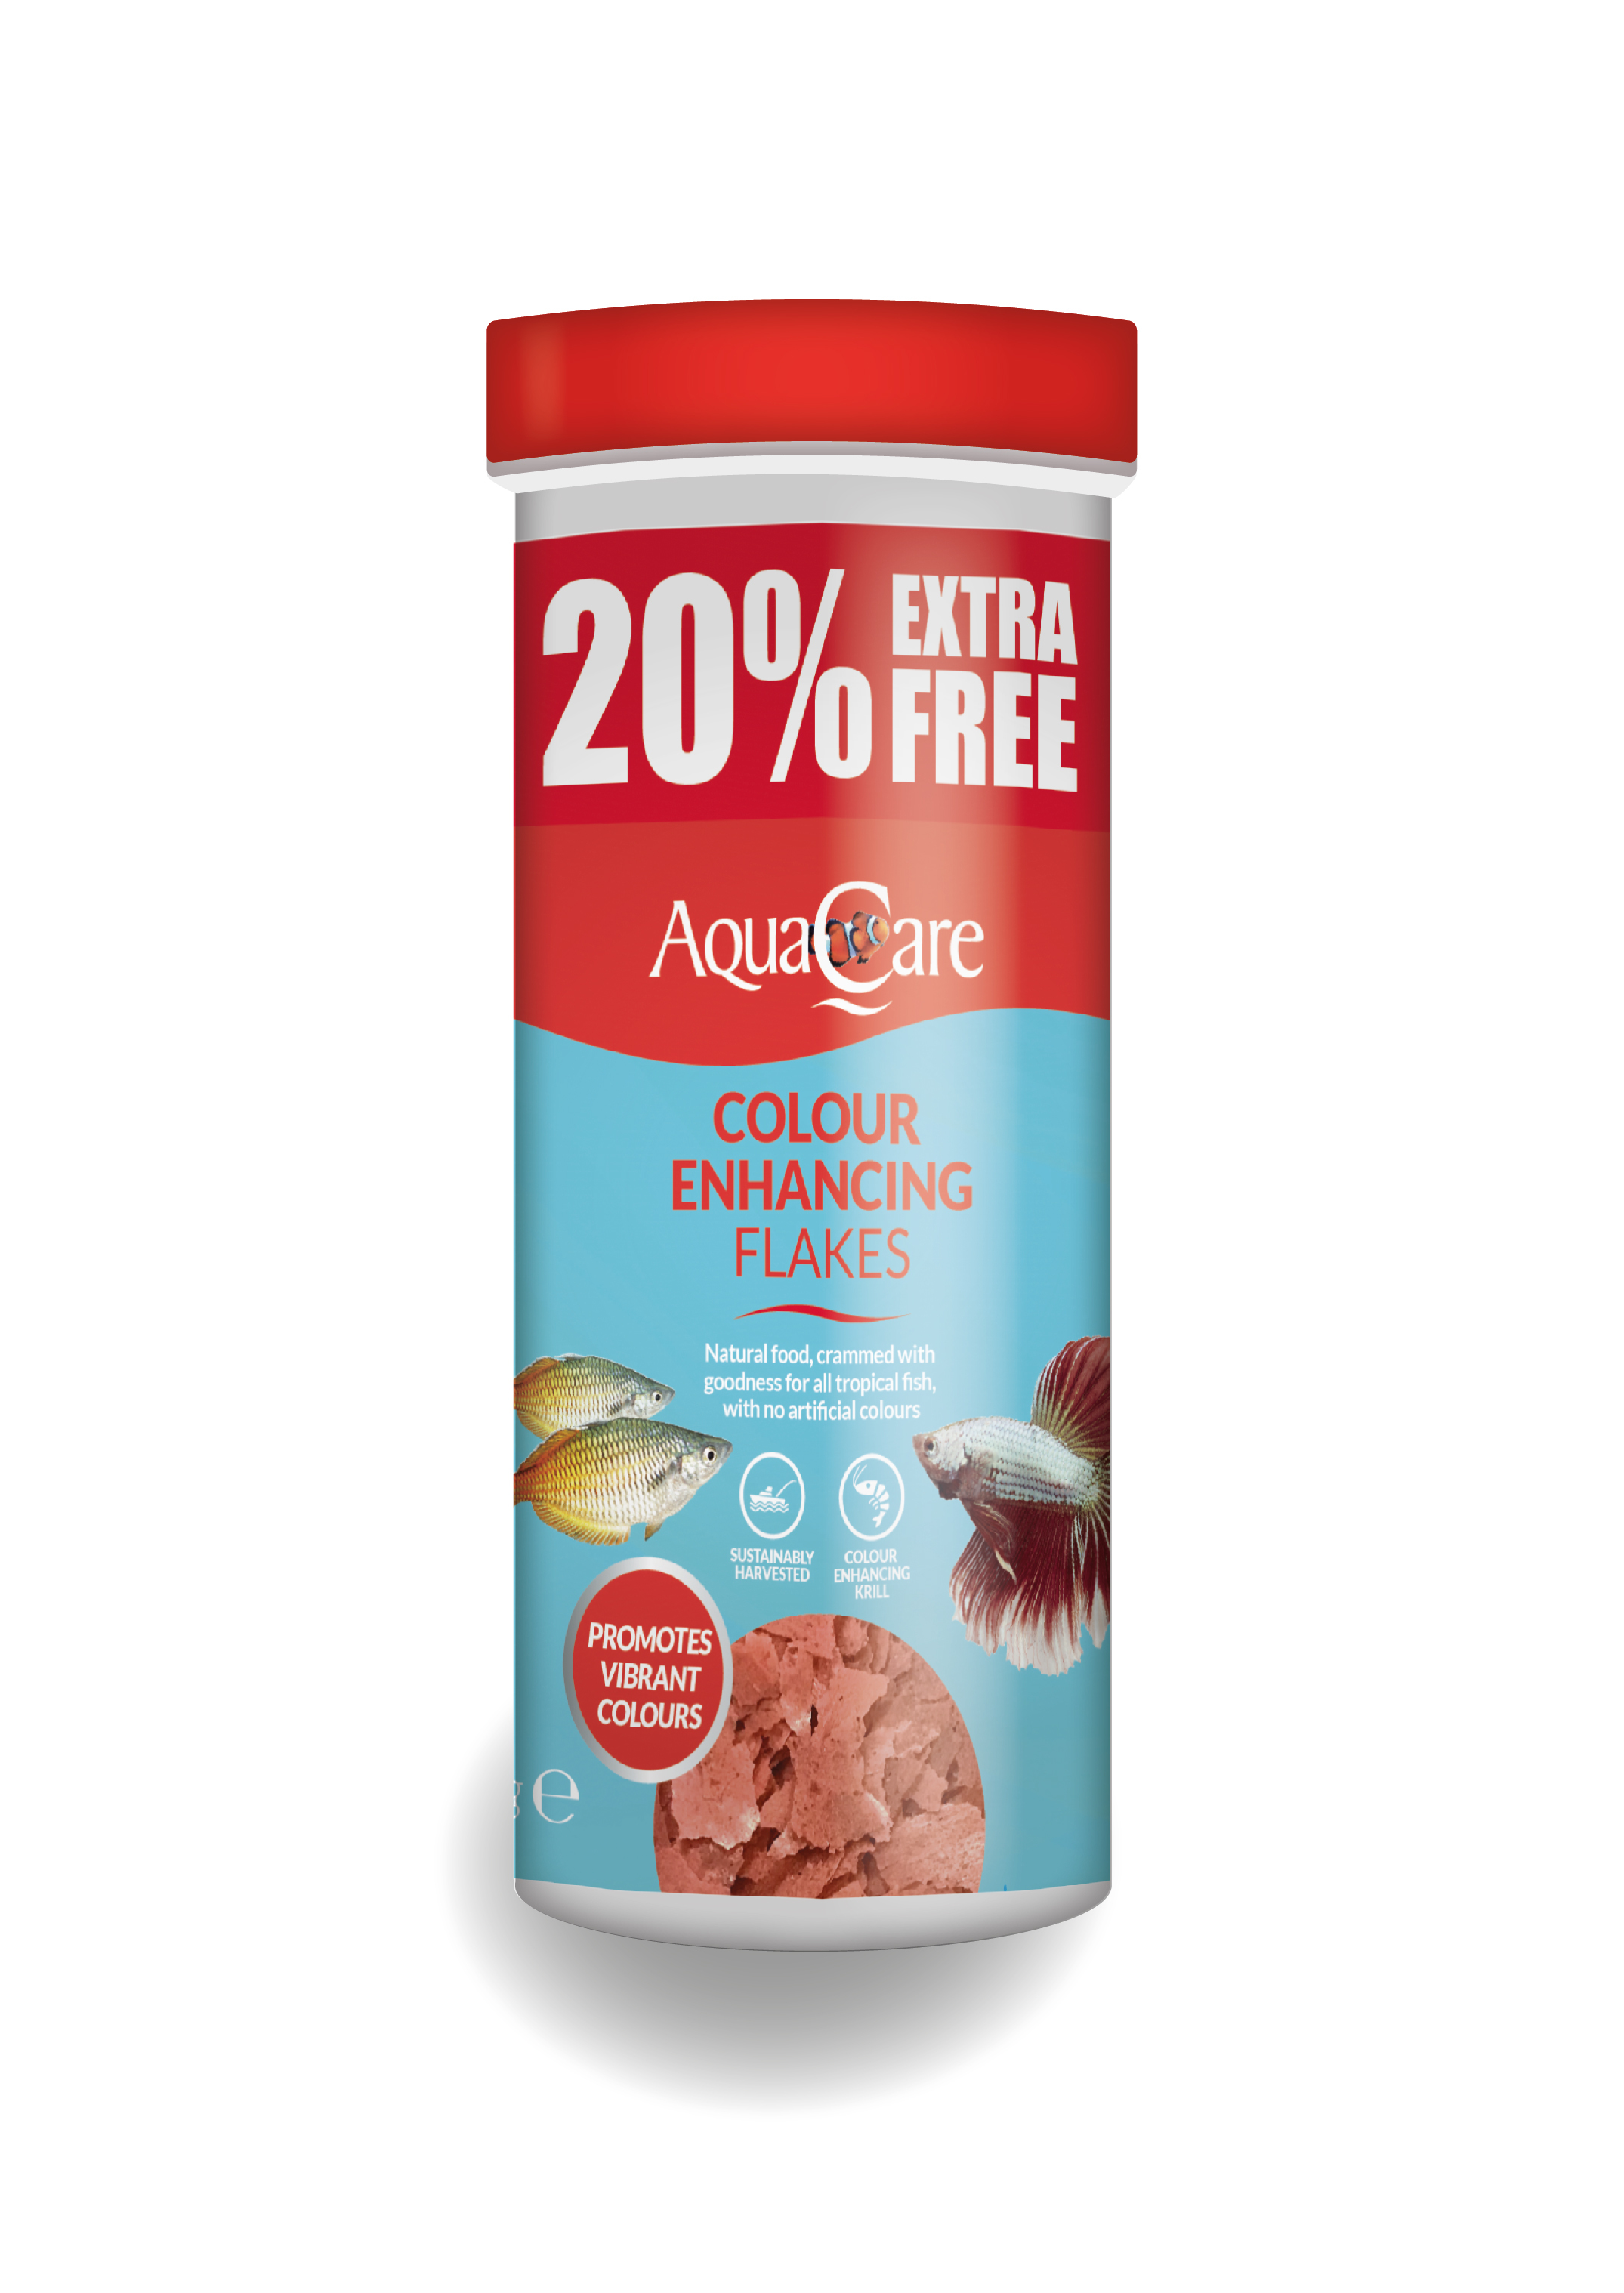 Aquacare Tall Colour Ehancing Render 2018 01